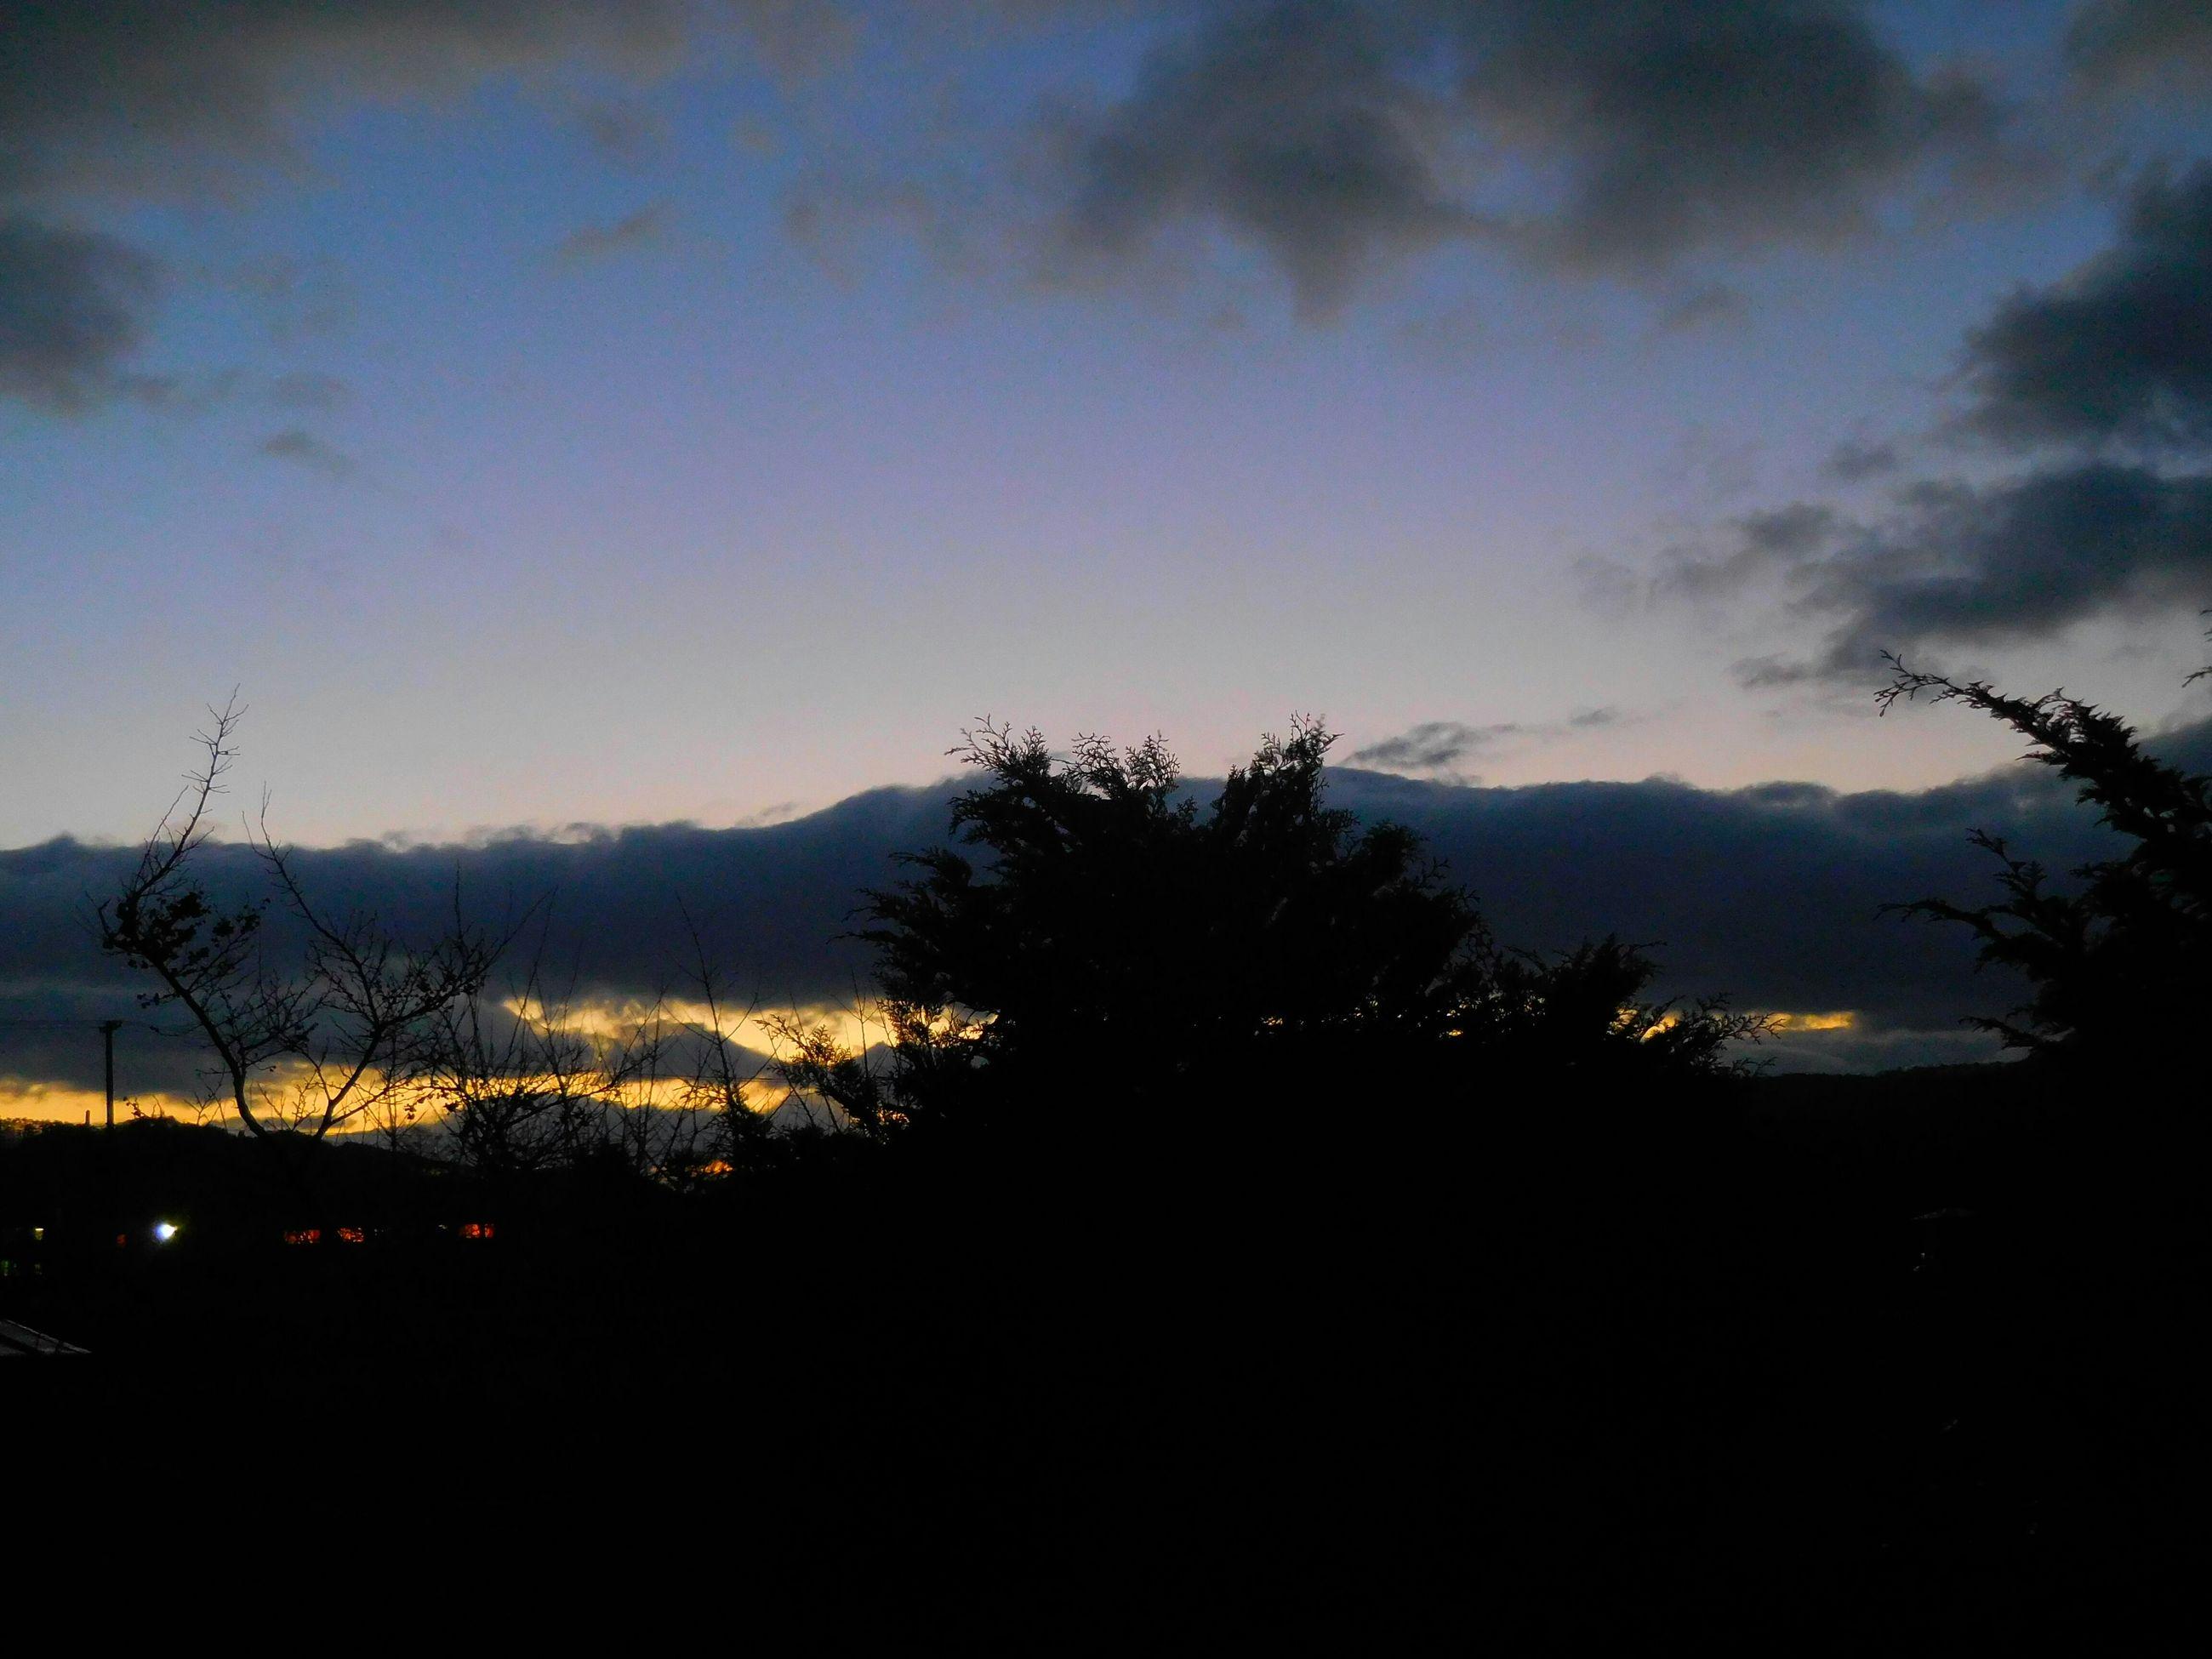 silhouette, sky, tree, tranquil scene, tranquility, mountain, scenics, beauty in nature, dusk, nature, landscape, cloud - sky, night, mountain range, dark, outdoors, growth, idyllic, no people, non-urban scene